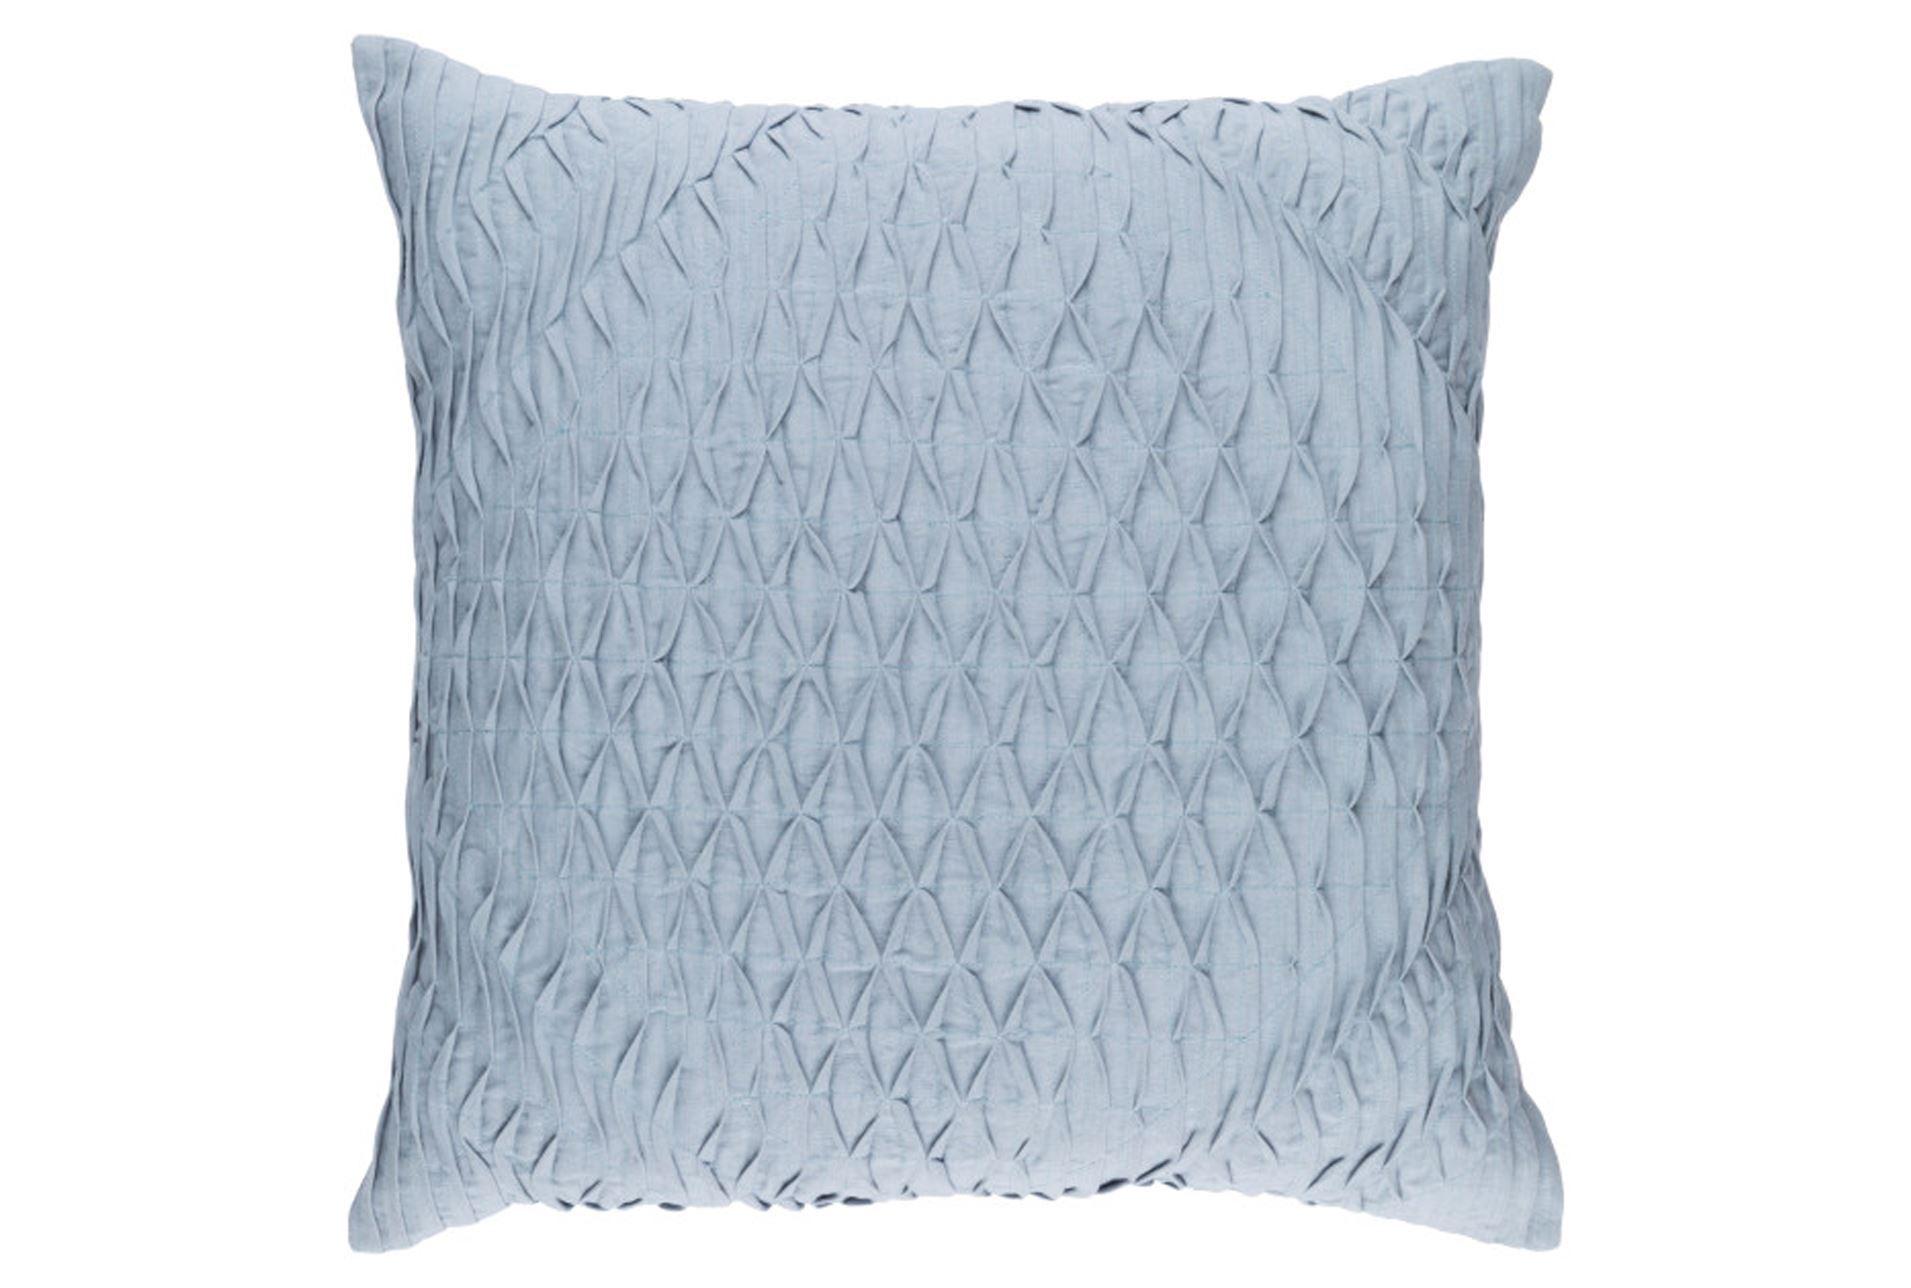 Accent Pillow-Annette Solid Blue 18X18 - Living Spaces